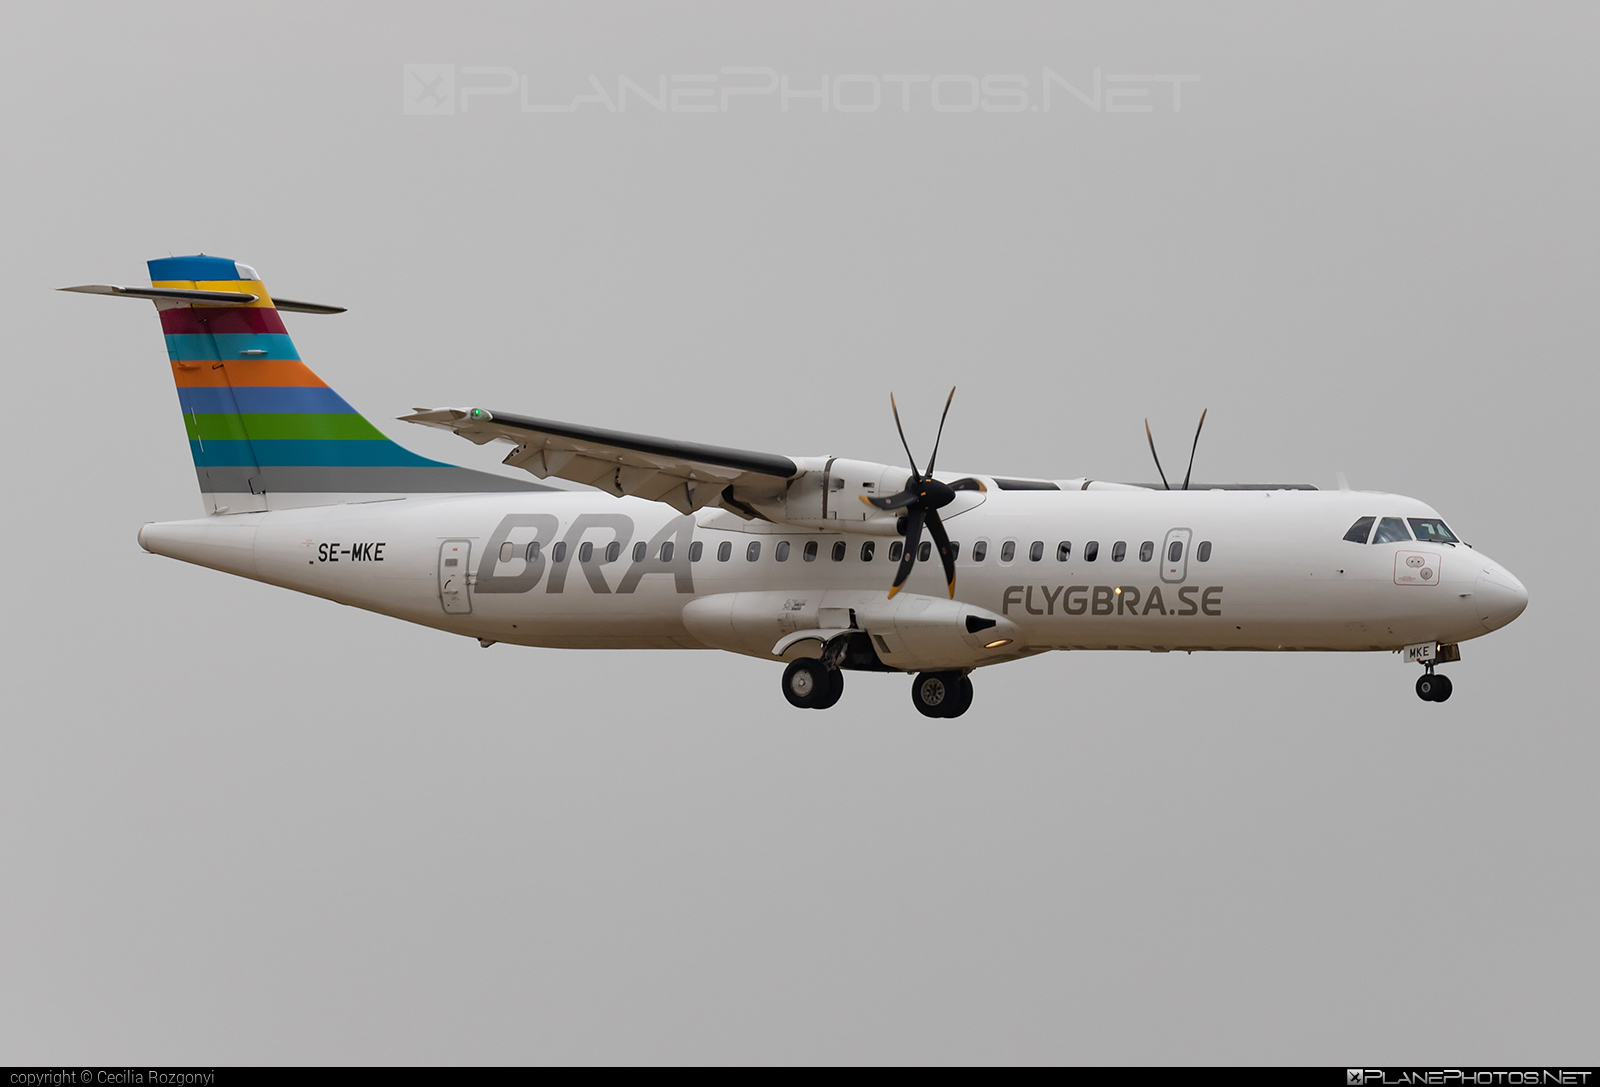 ATR 72-600 - SE-MKE operated by Braathens Regional Airlines #atr #atr72 #atr72600